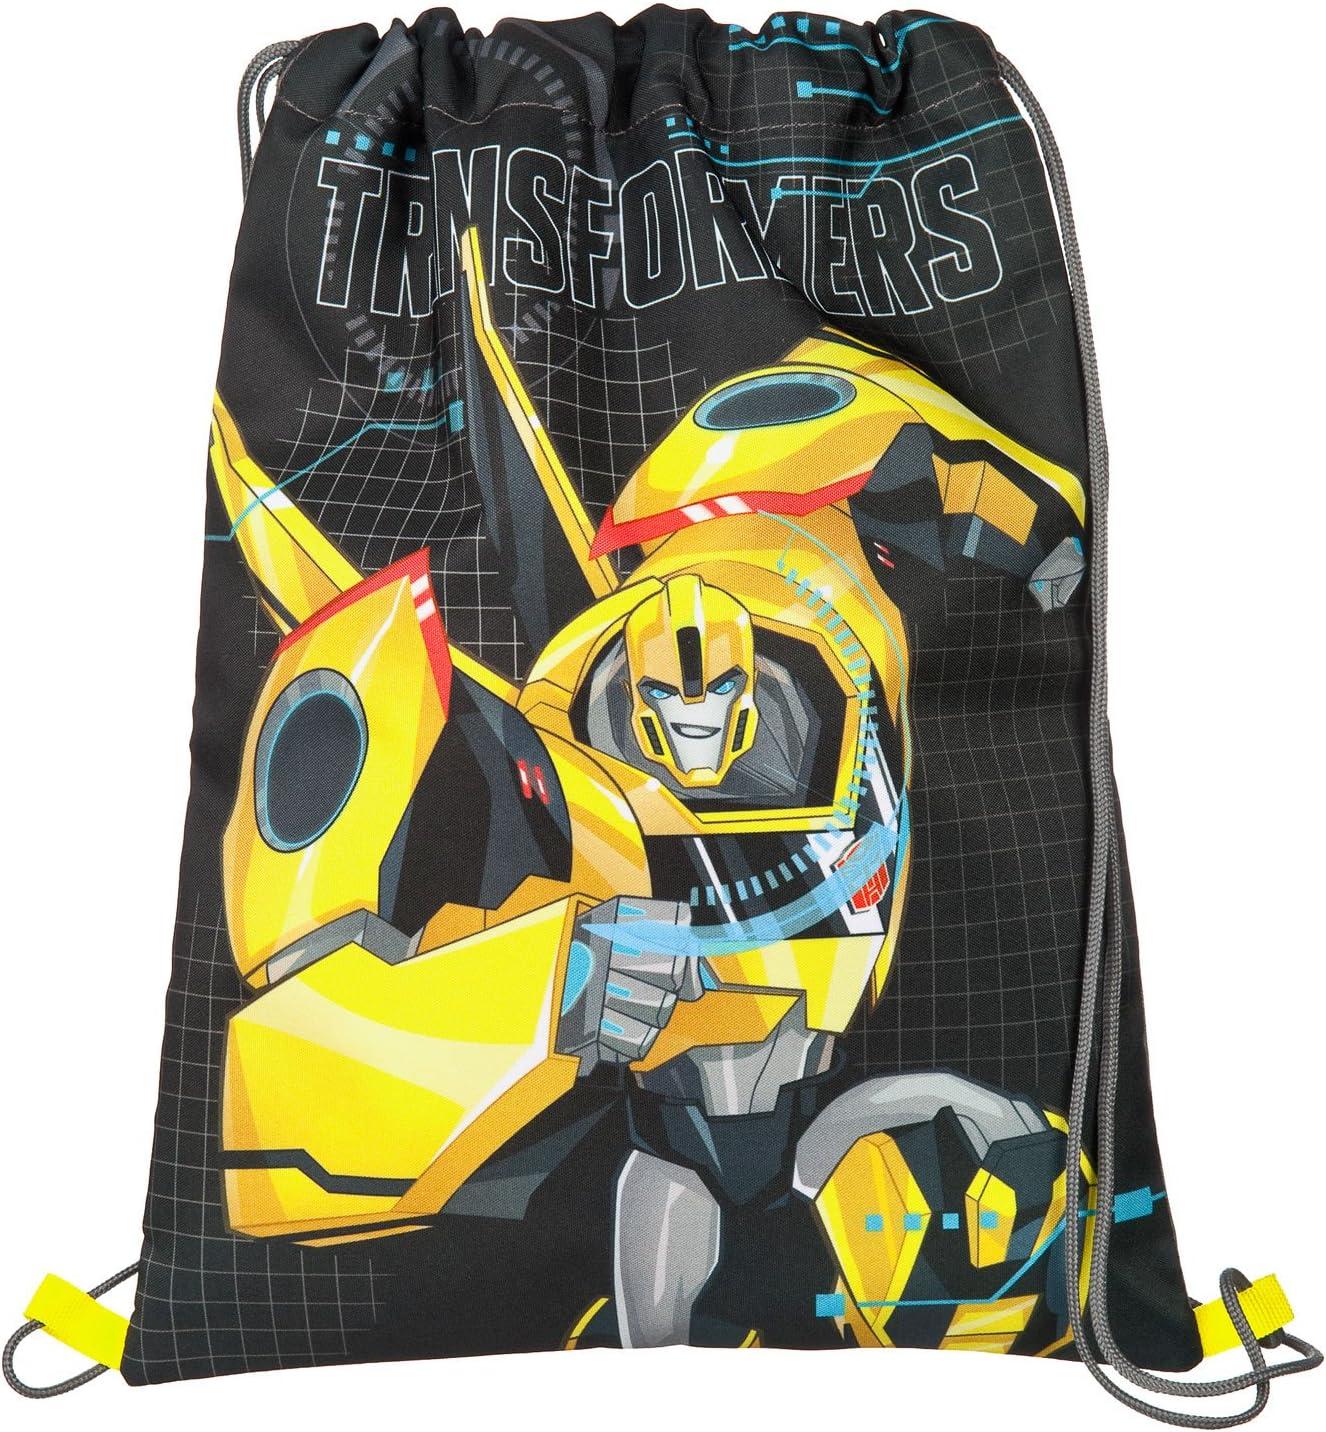 Transformers /Amis Livre A5 Undercover tfuv0962/